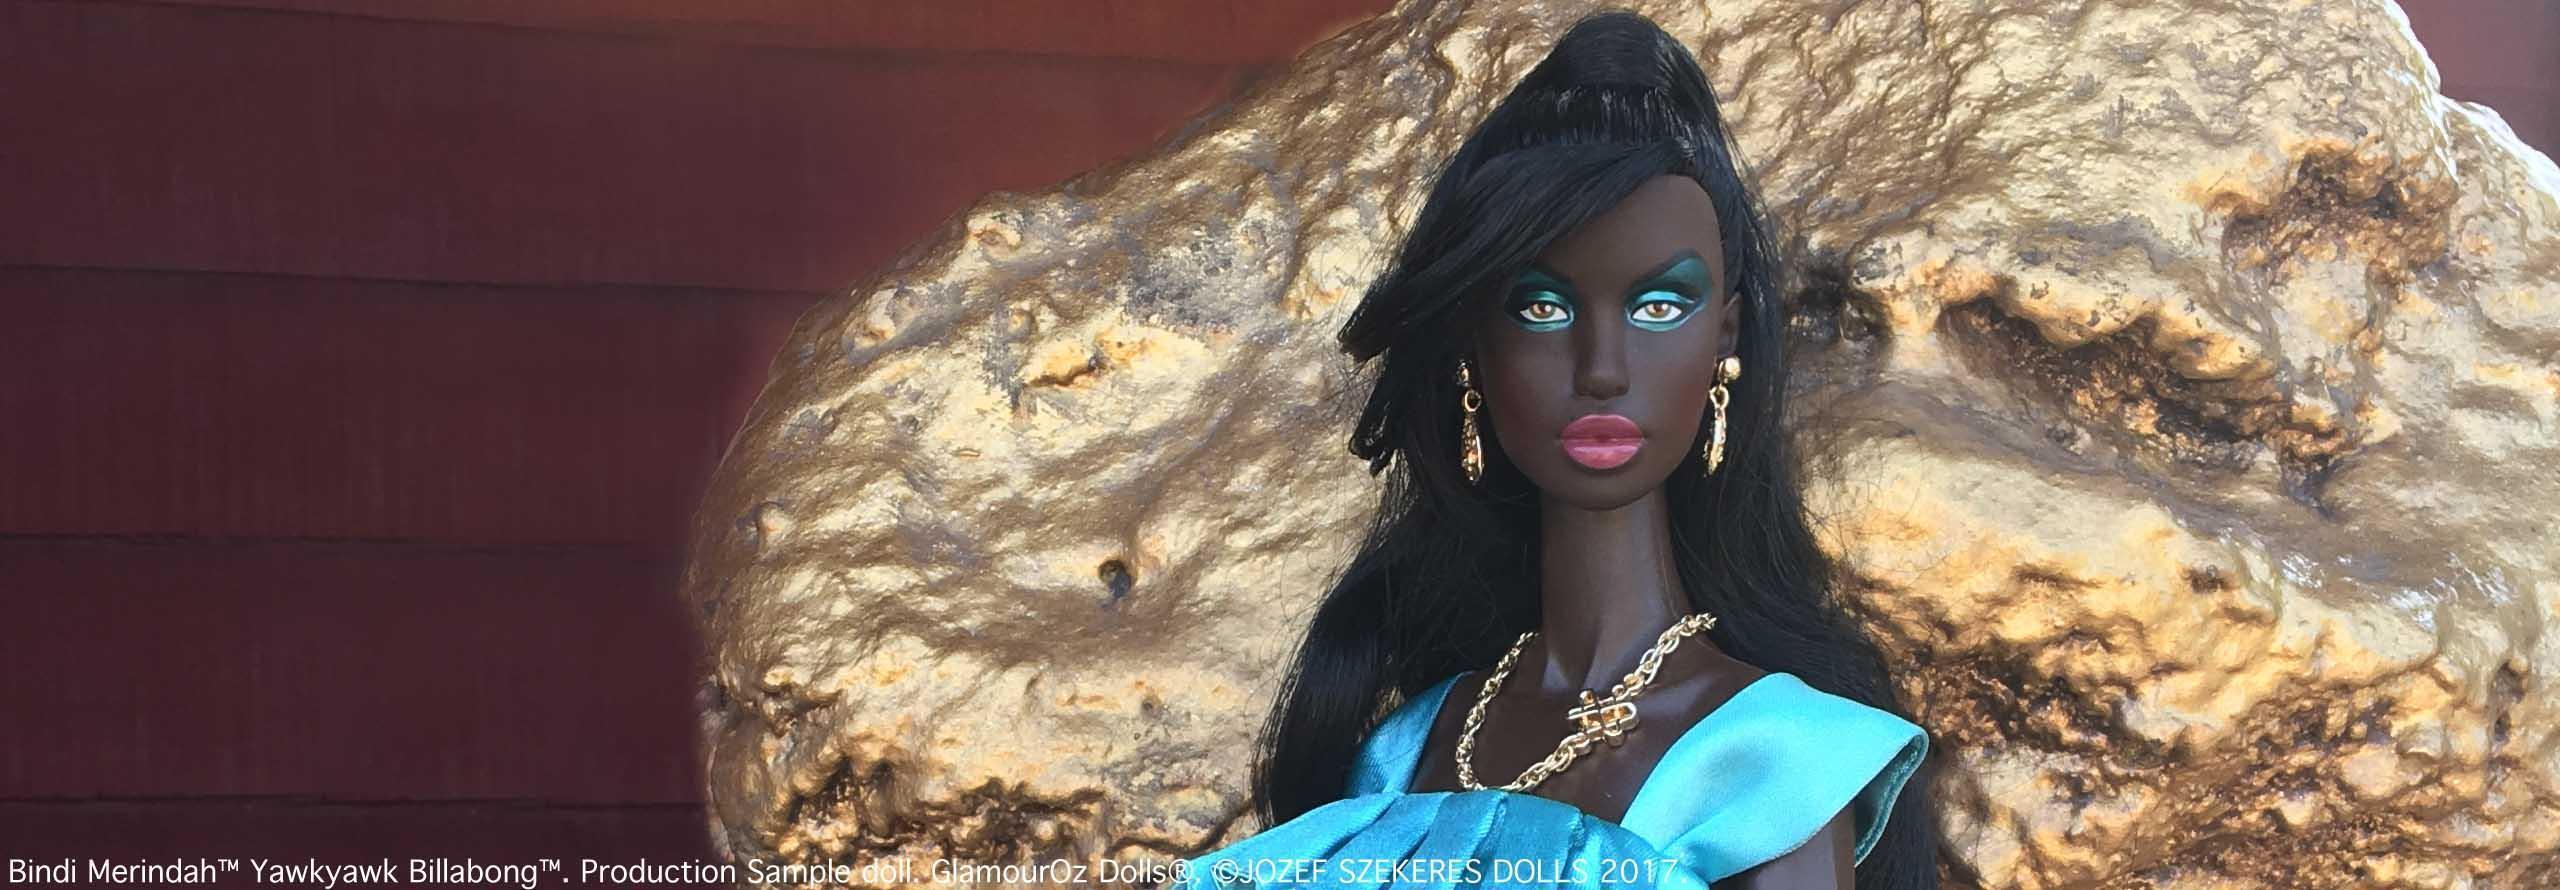 GODs Slider 1.Bindi Merindah™ Yawkyawk Billabong™. Production Sample doll.